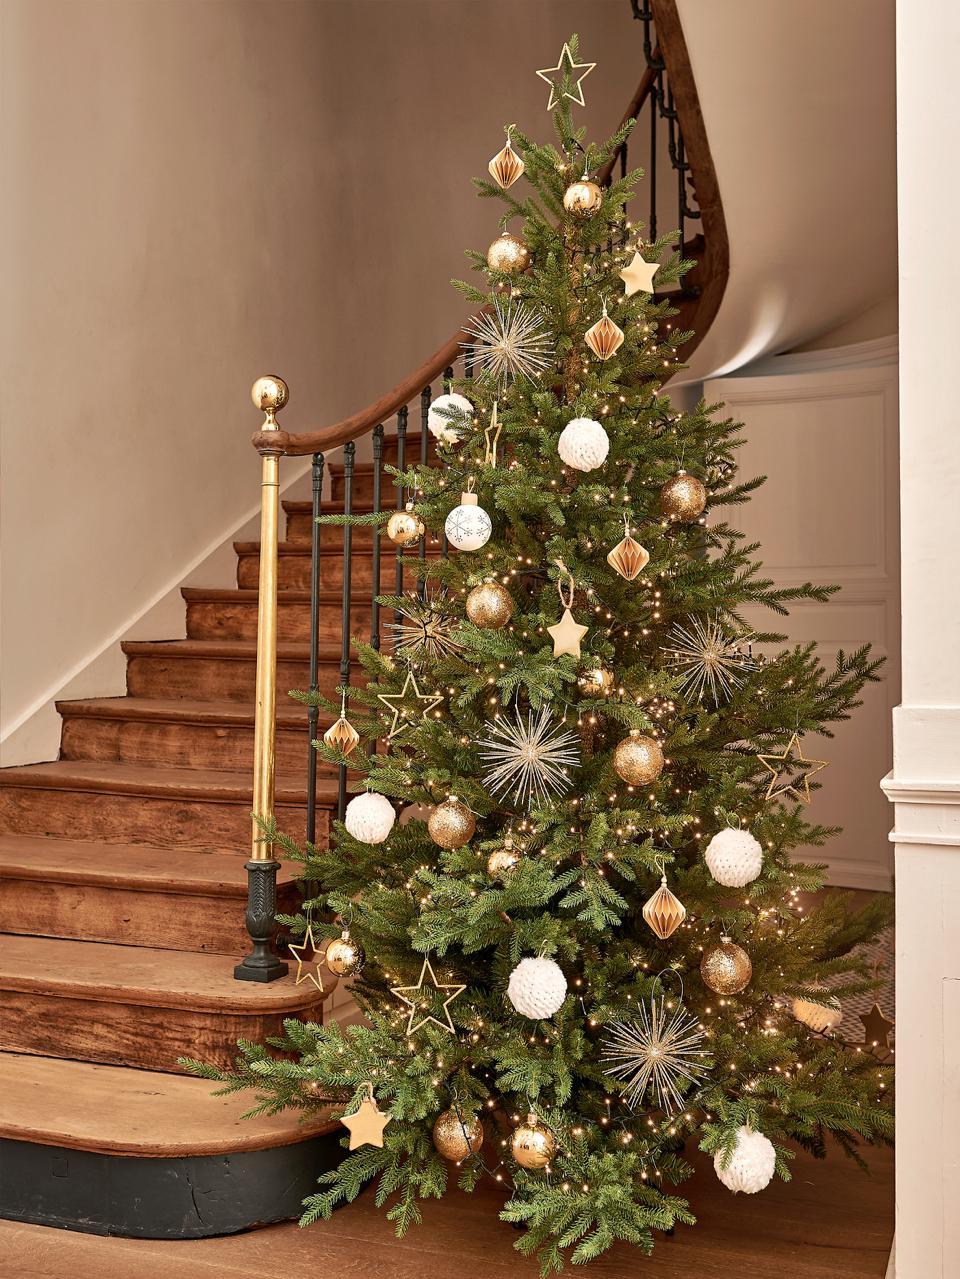 weihnachtsdeko-profitipps-decohome.de-maisons-du-monde_mdm-gold